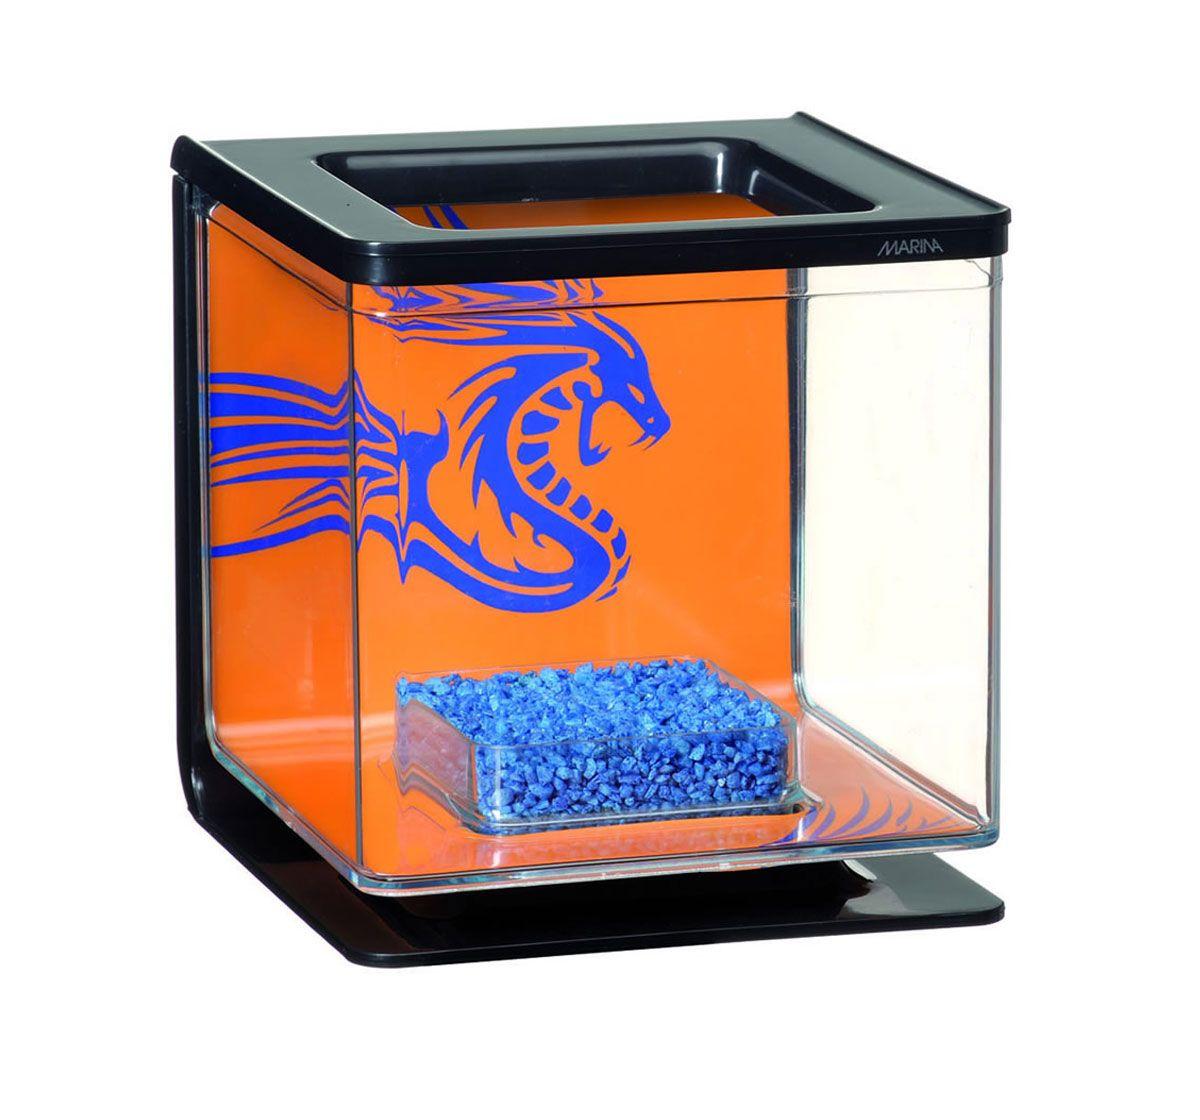 Marina Betta Kit Boy Theme 2 Ltr Aquarium Fish Fishing Products Fish Care